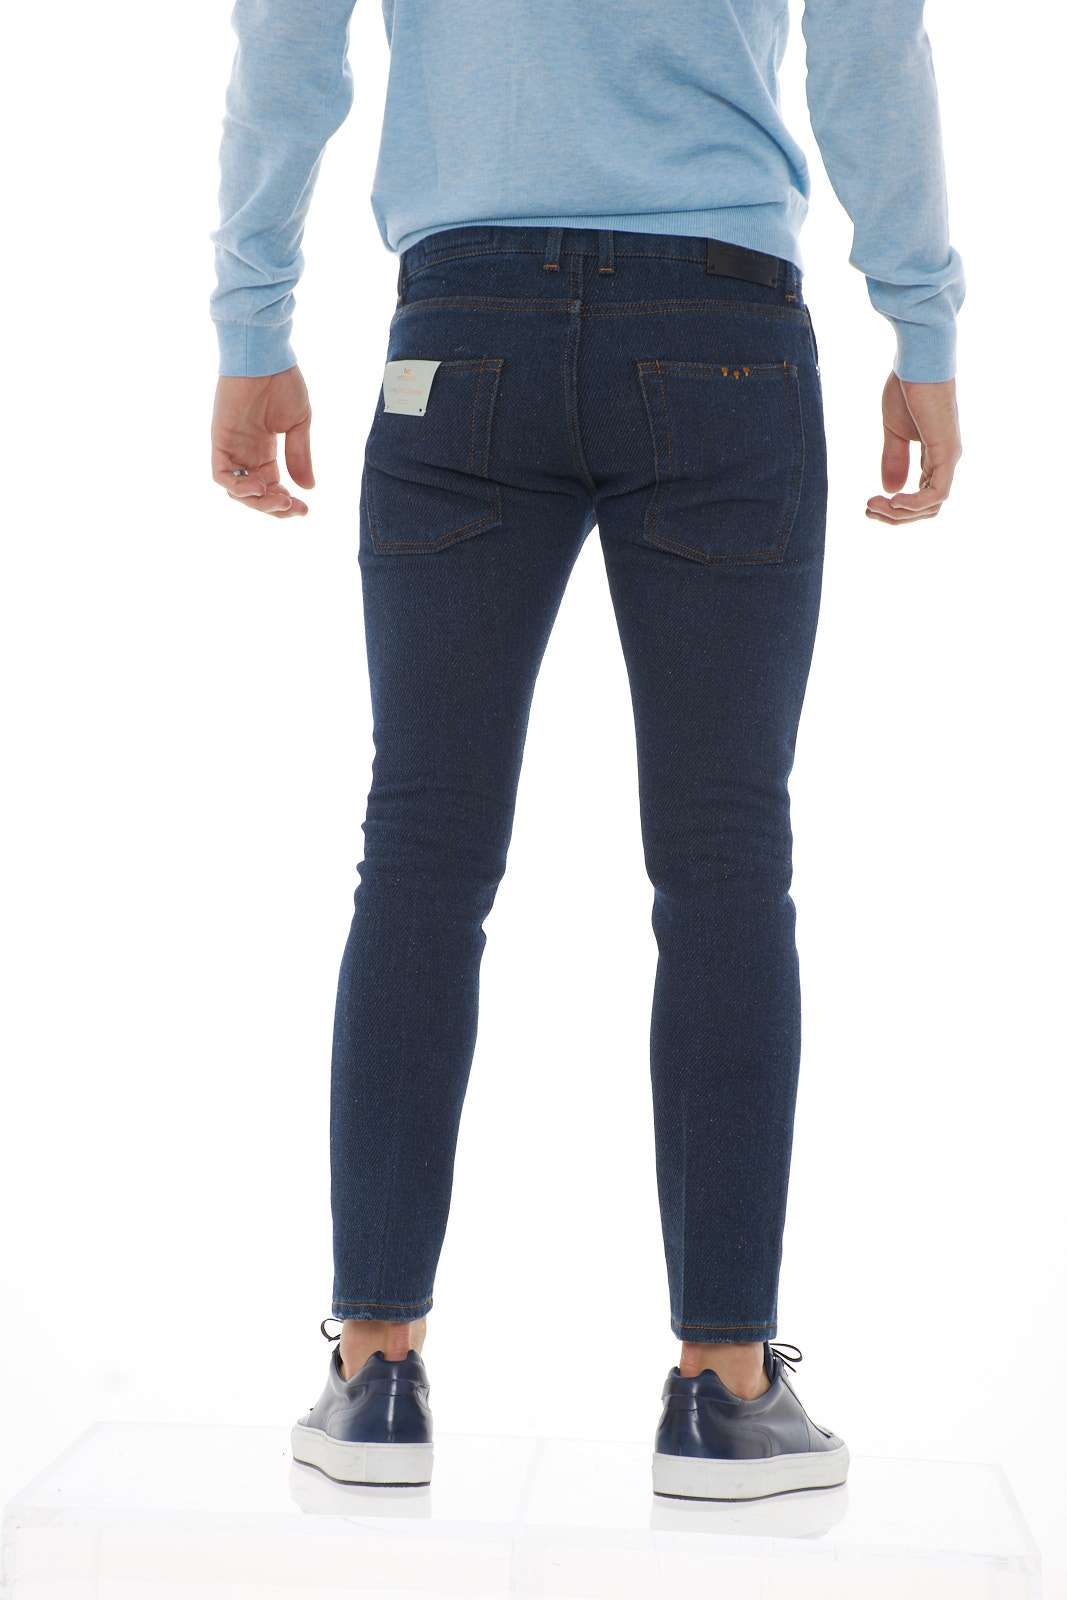 https://www.parmax.com/media/tmp/catalog/product/a/i/ai-outlet_parmax-pantaloni-uomo-entre-amis-a19gaga1208l457-c.jpg